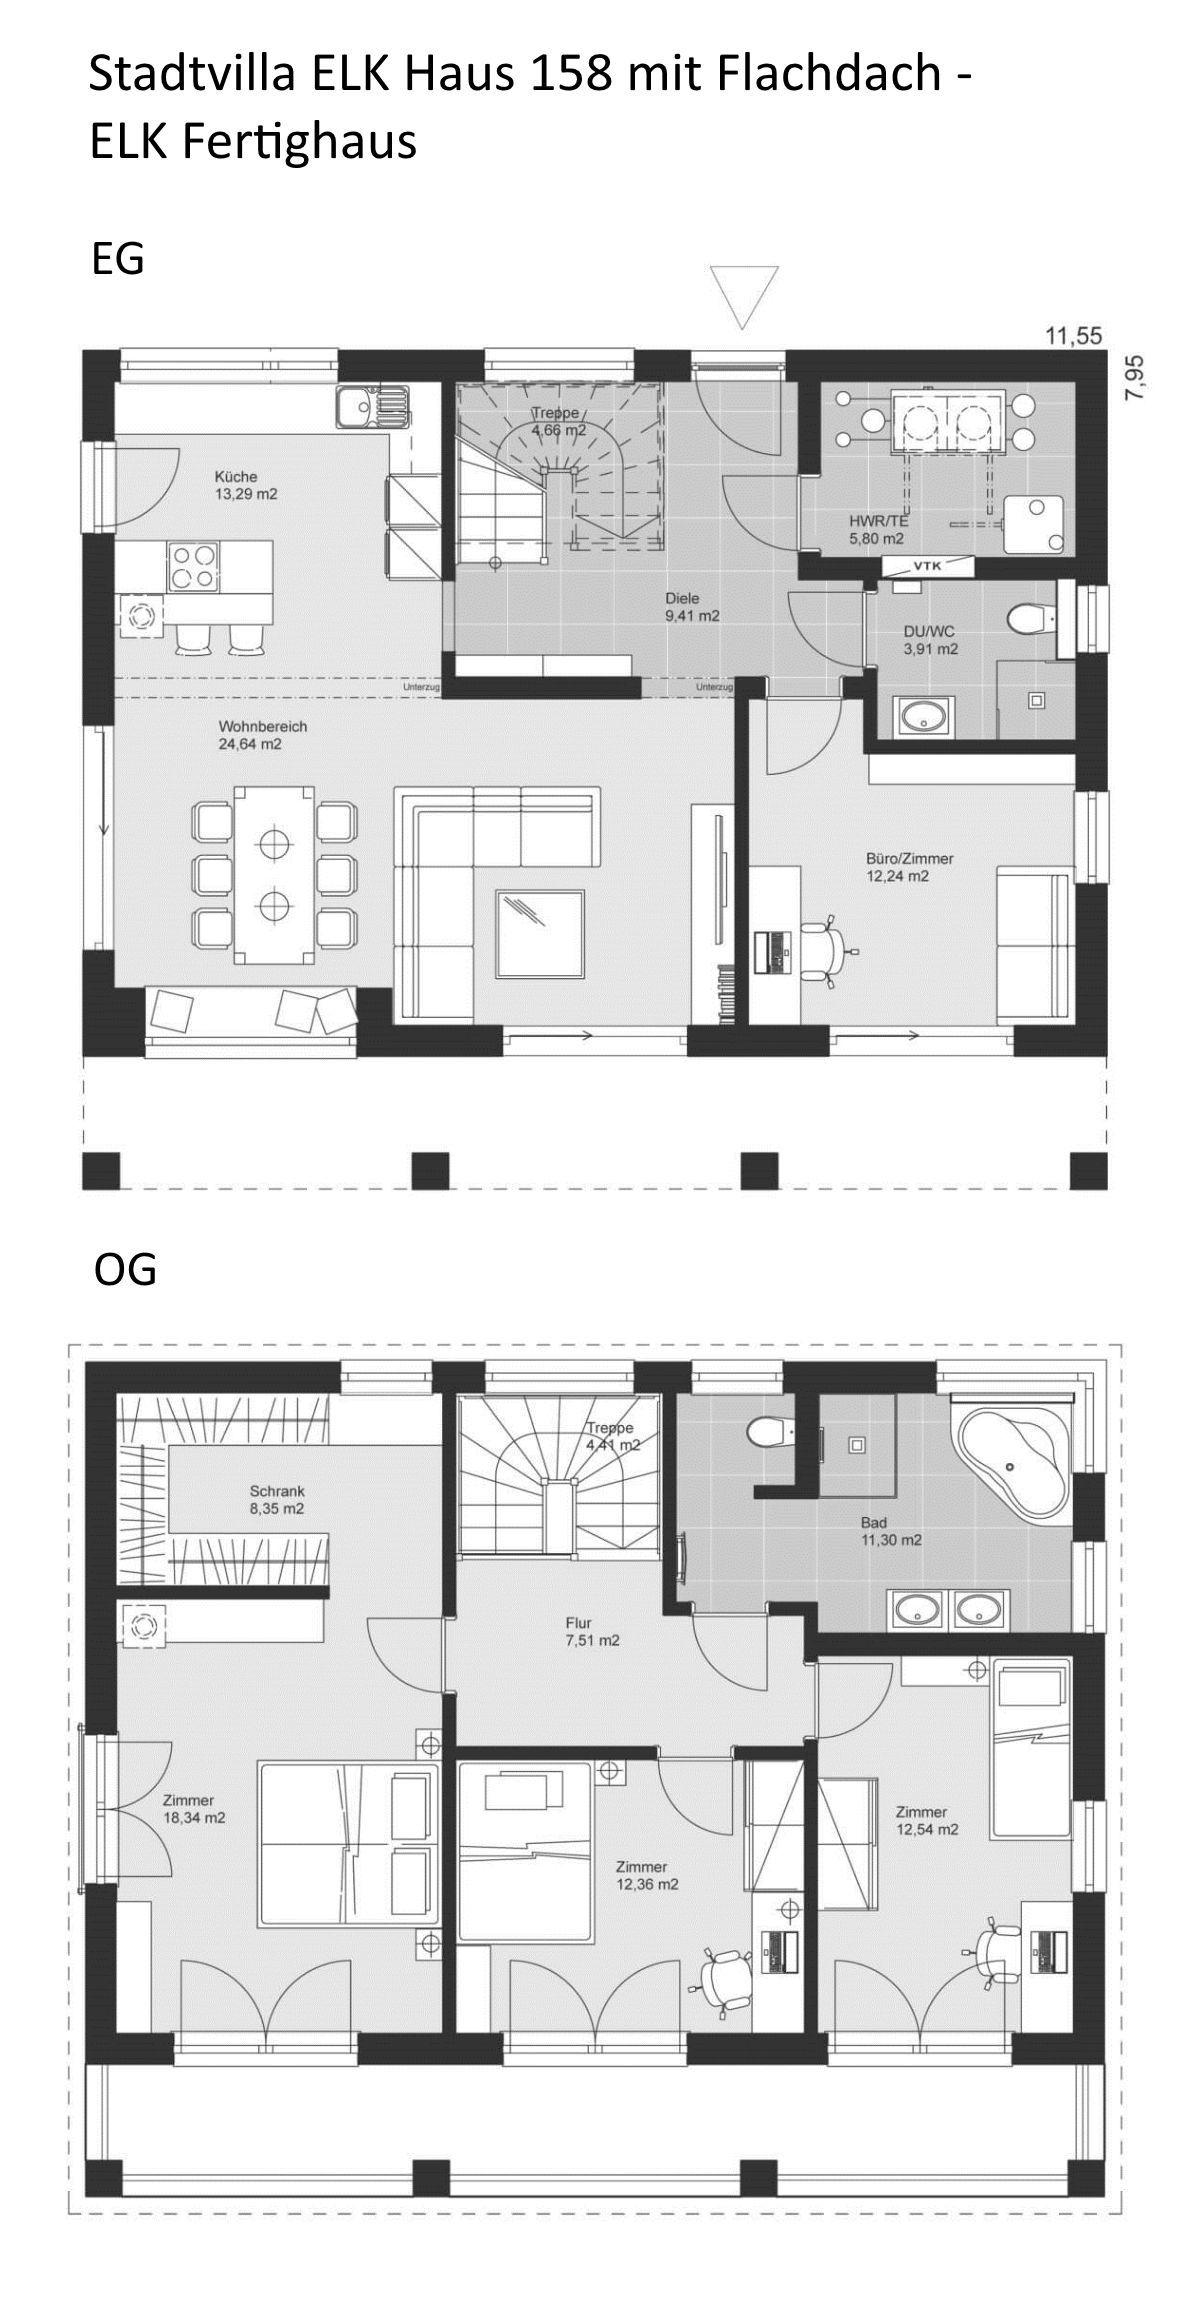 Grundriss Bauhaus Stadtvilla modern mit Flachdach